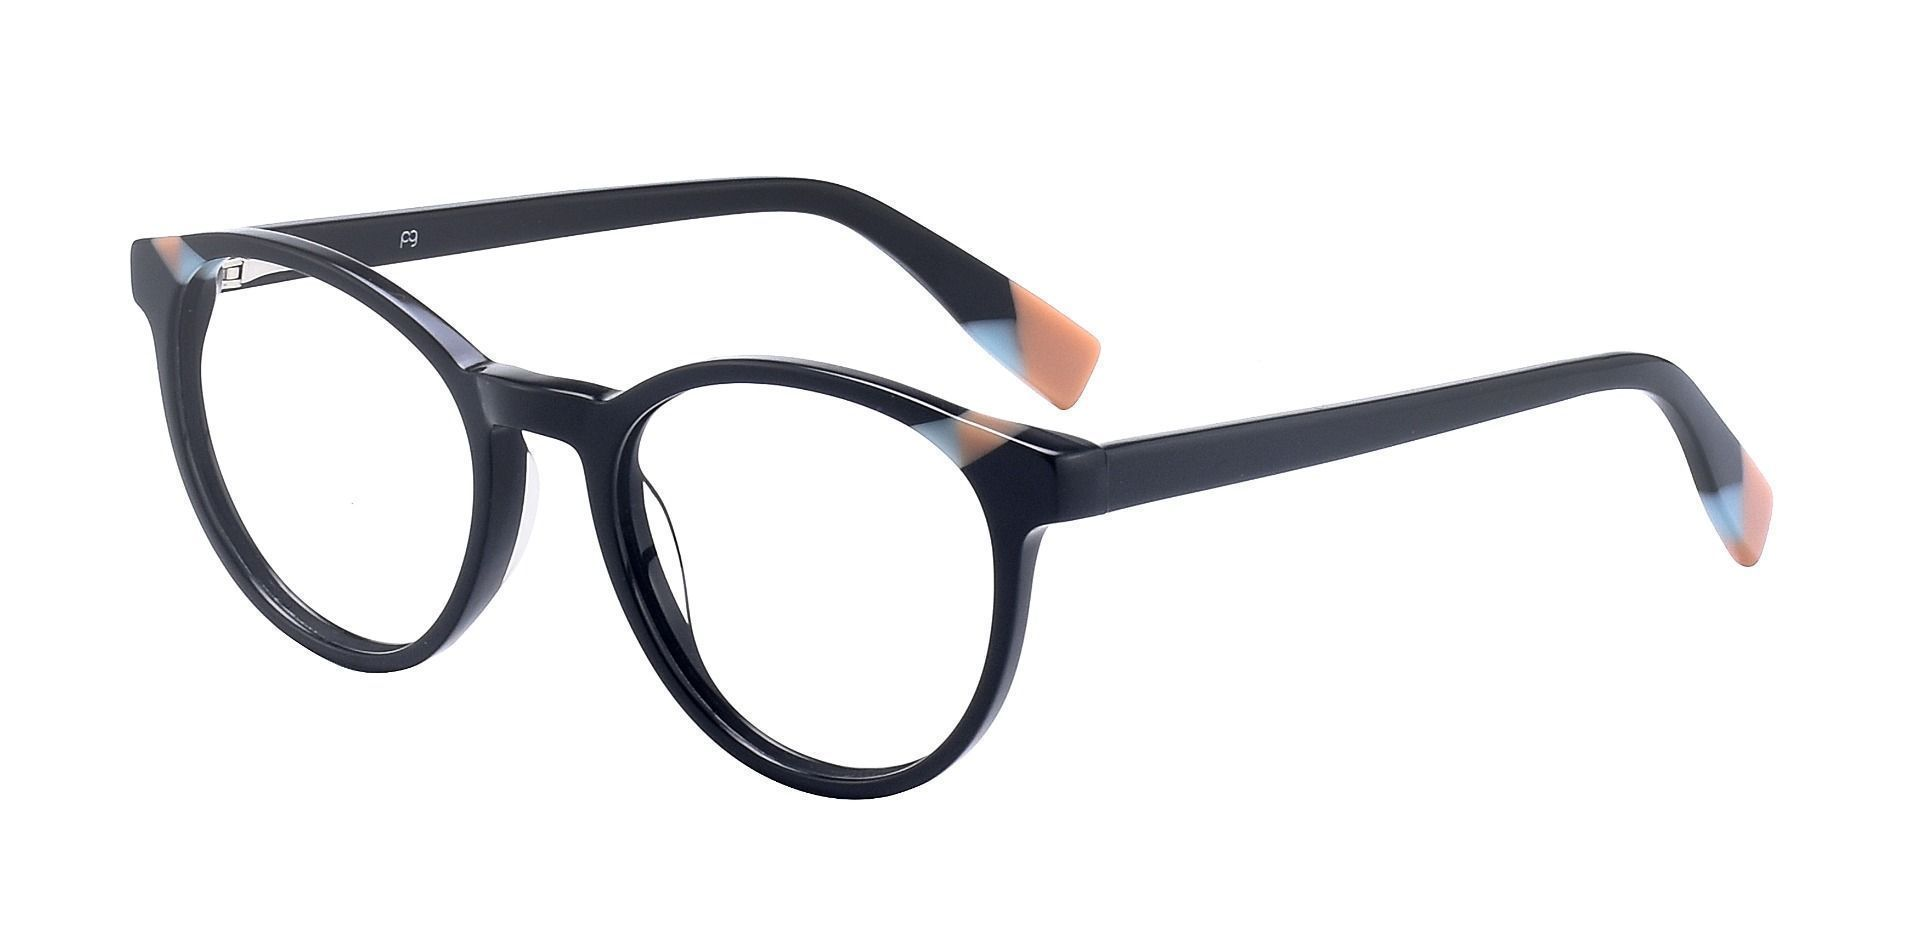 Odette Oval Prescription Glasses - The Frame Is Black And Brown